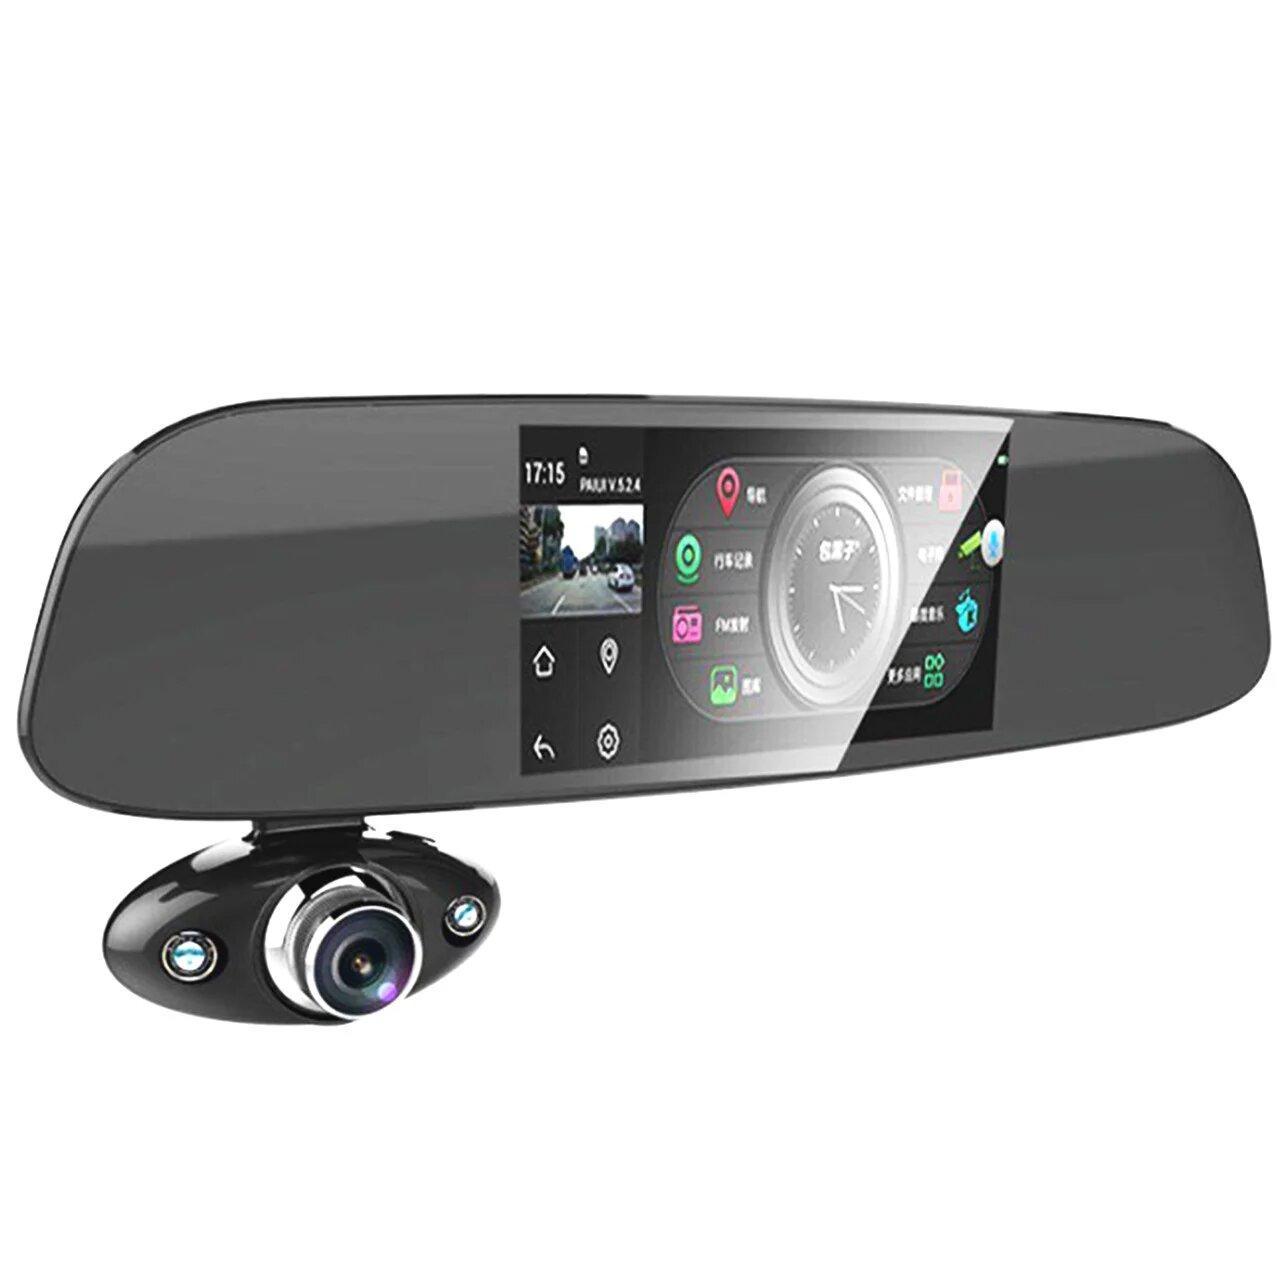 Дзеркало реєстратор 5 Anytek B33 Vehicle Blackbox дві камери g-сенсор 5 Мп (3934-11406)